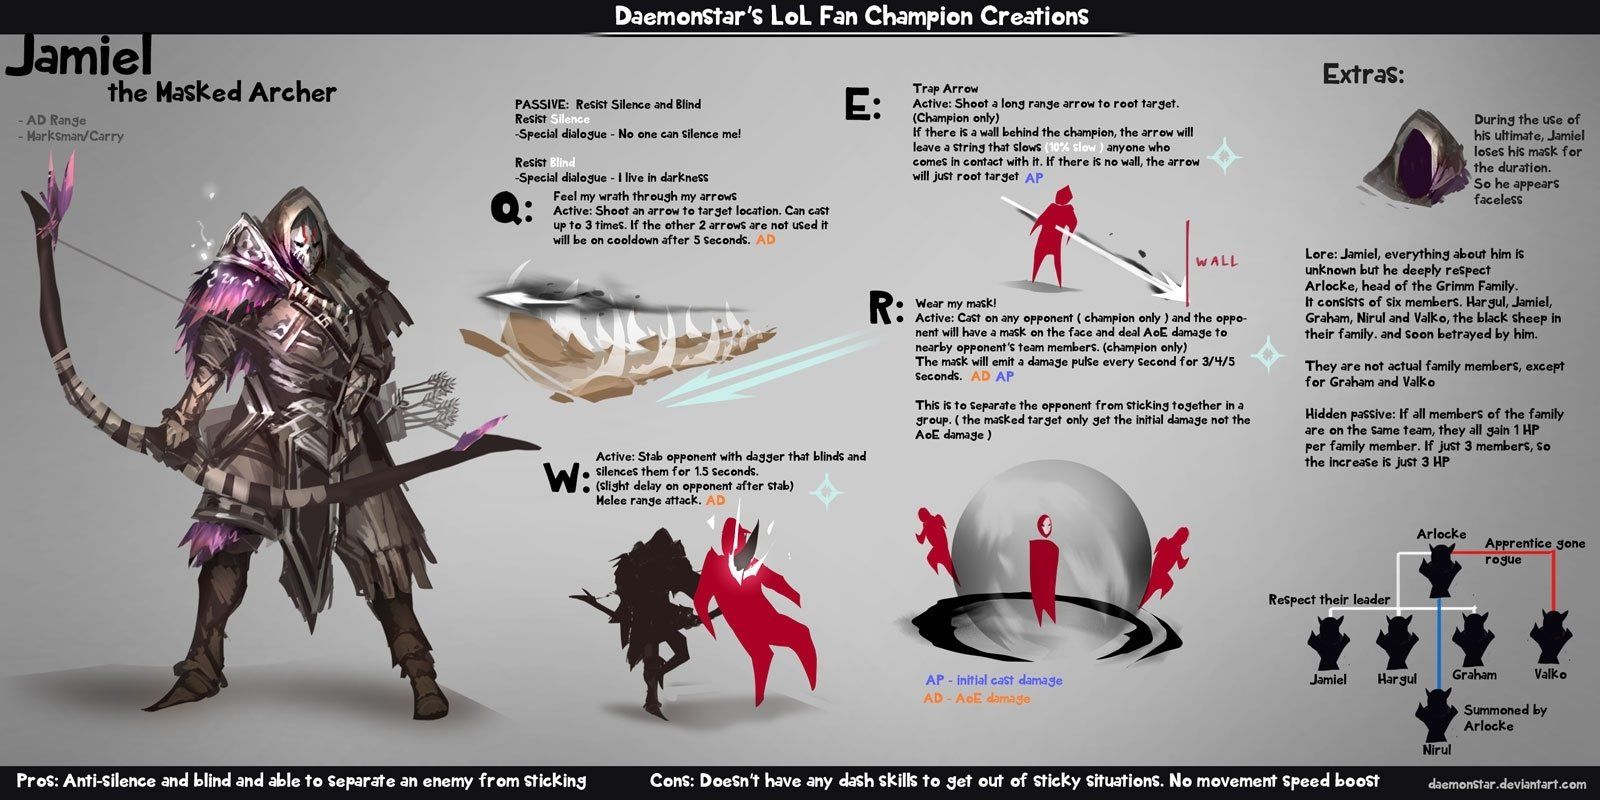 10 Best League Of Legends Champion Ideas lol fan champion creations jamieldaemonstar on deviantart 2021